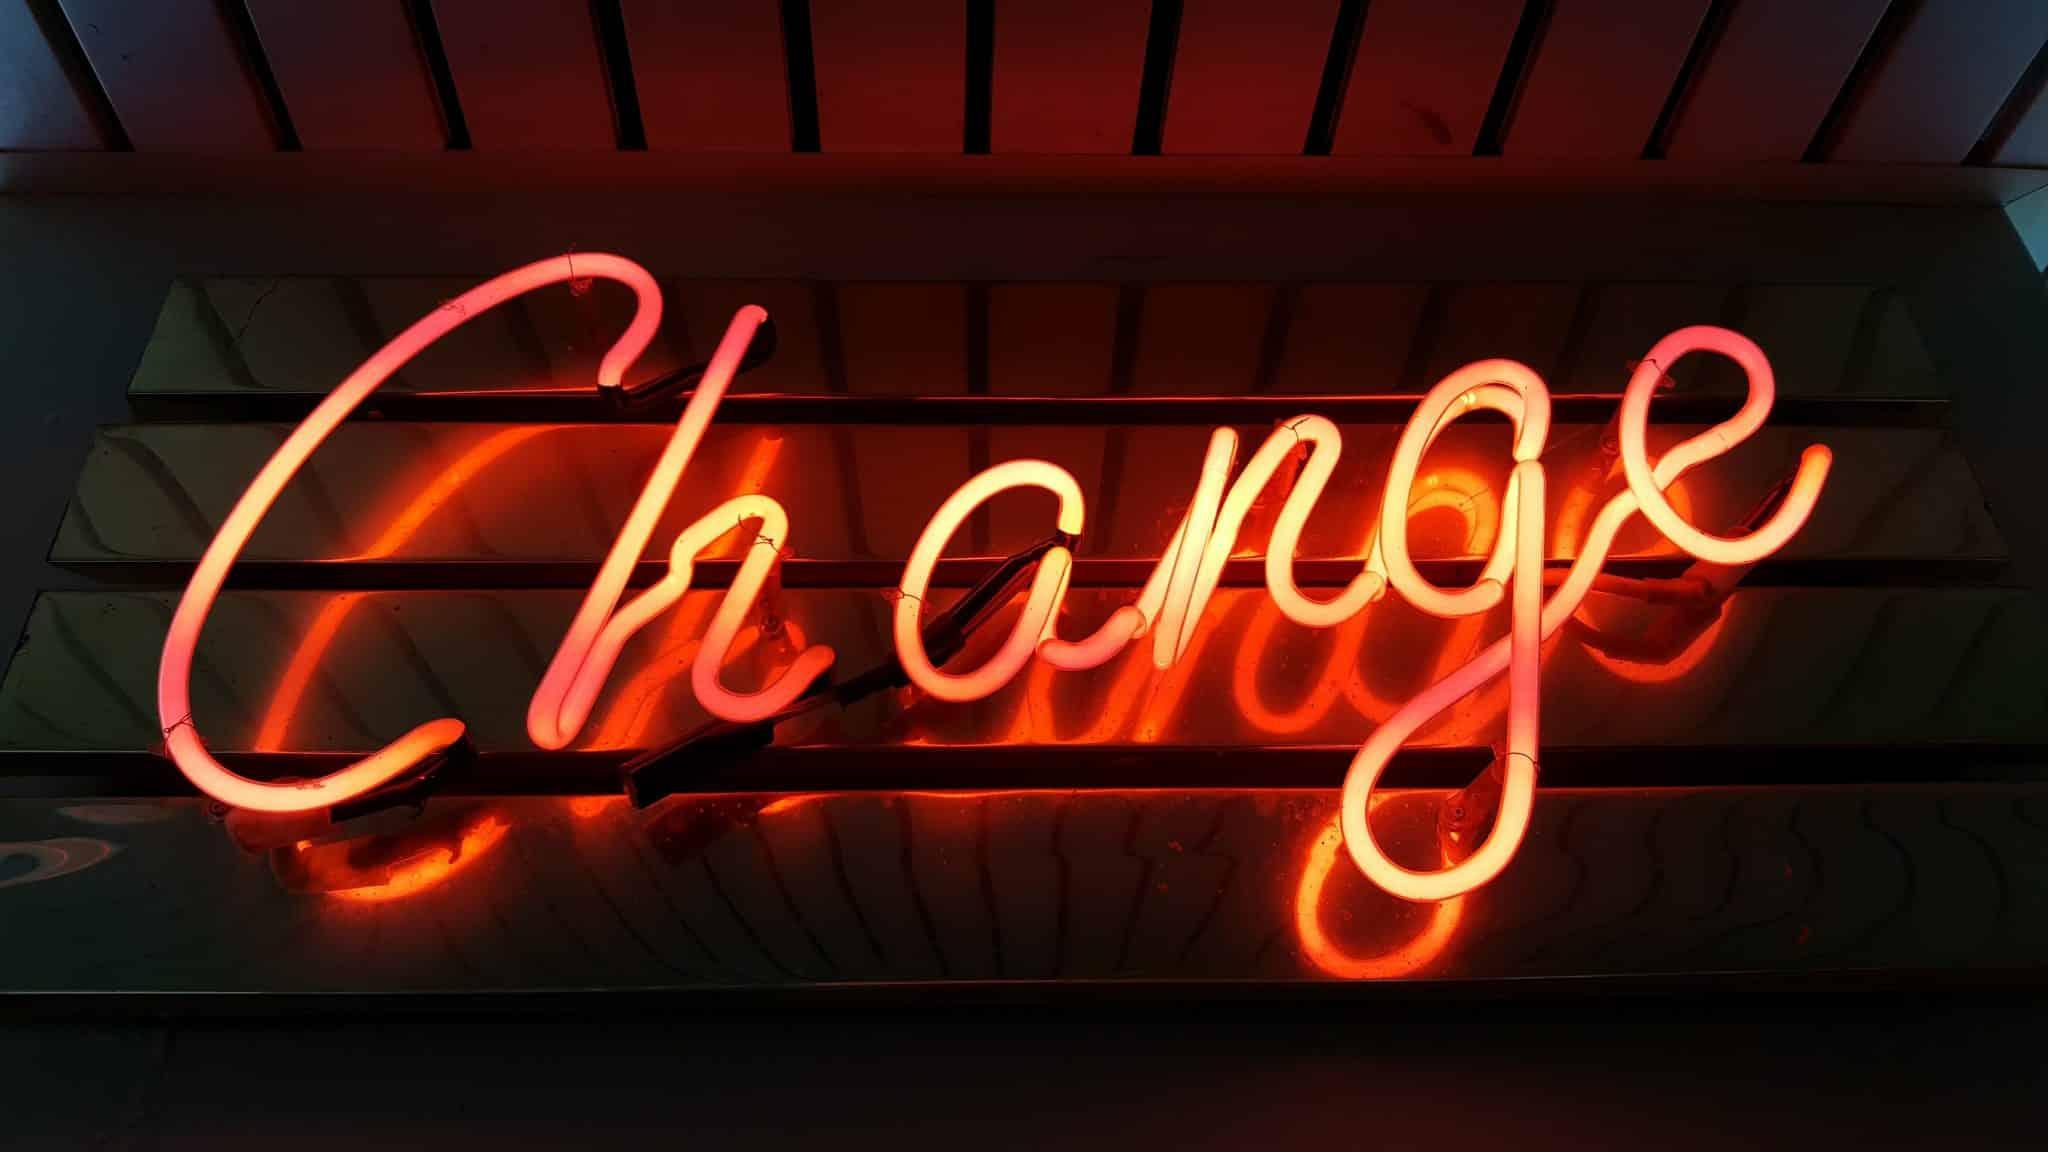 Change your old website